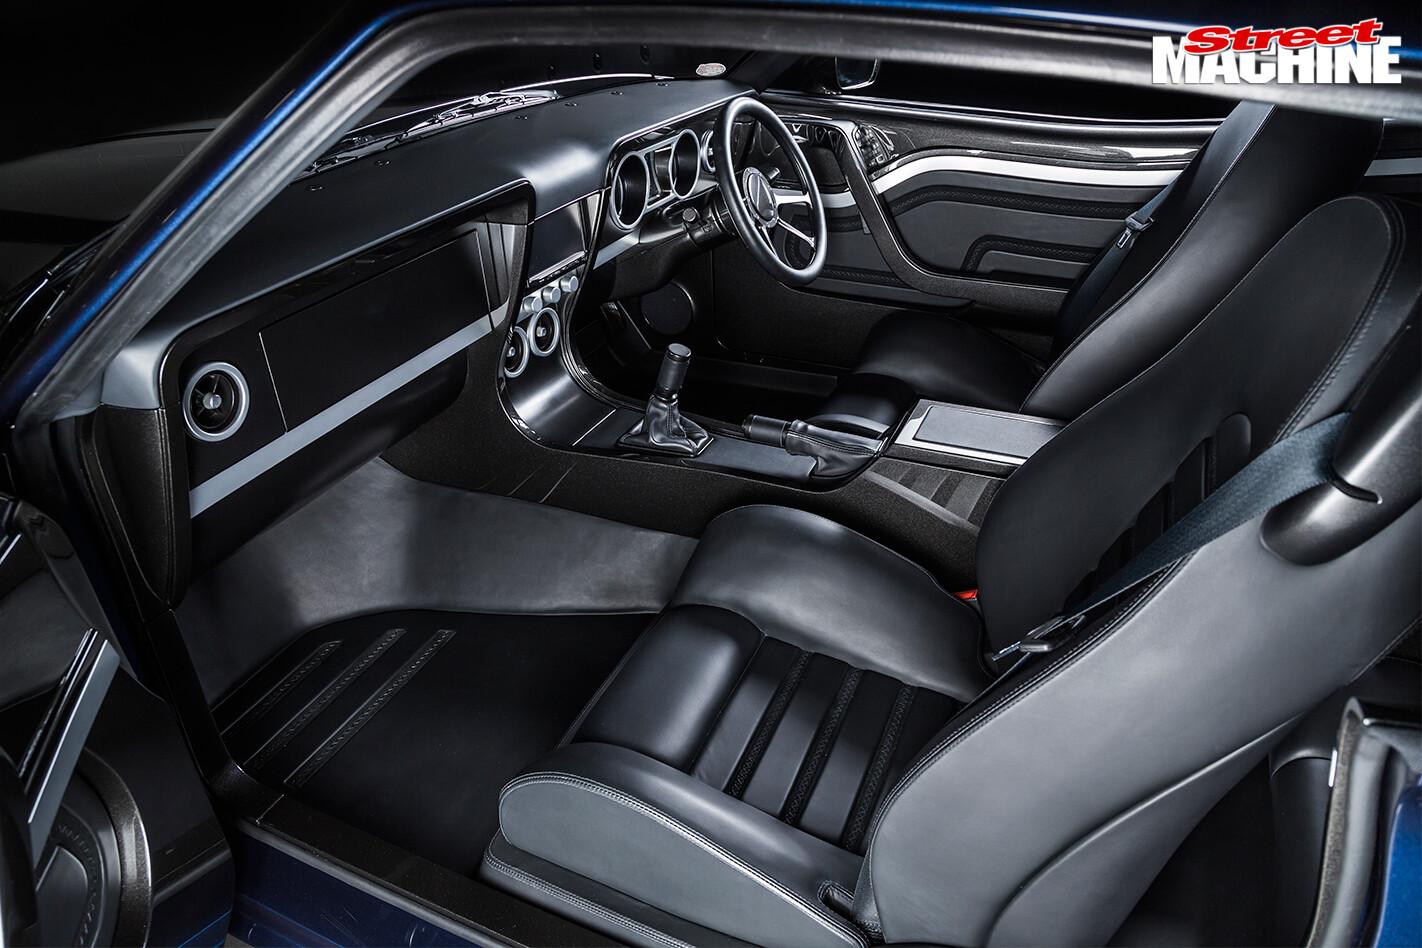 Falcon -XB-coupe -XBOSS-interior -front